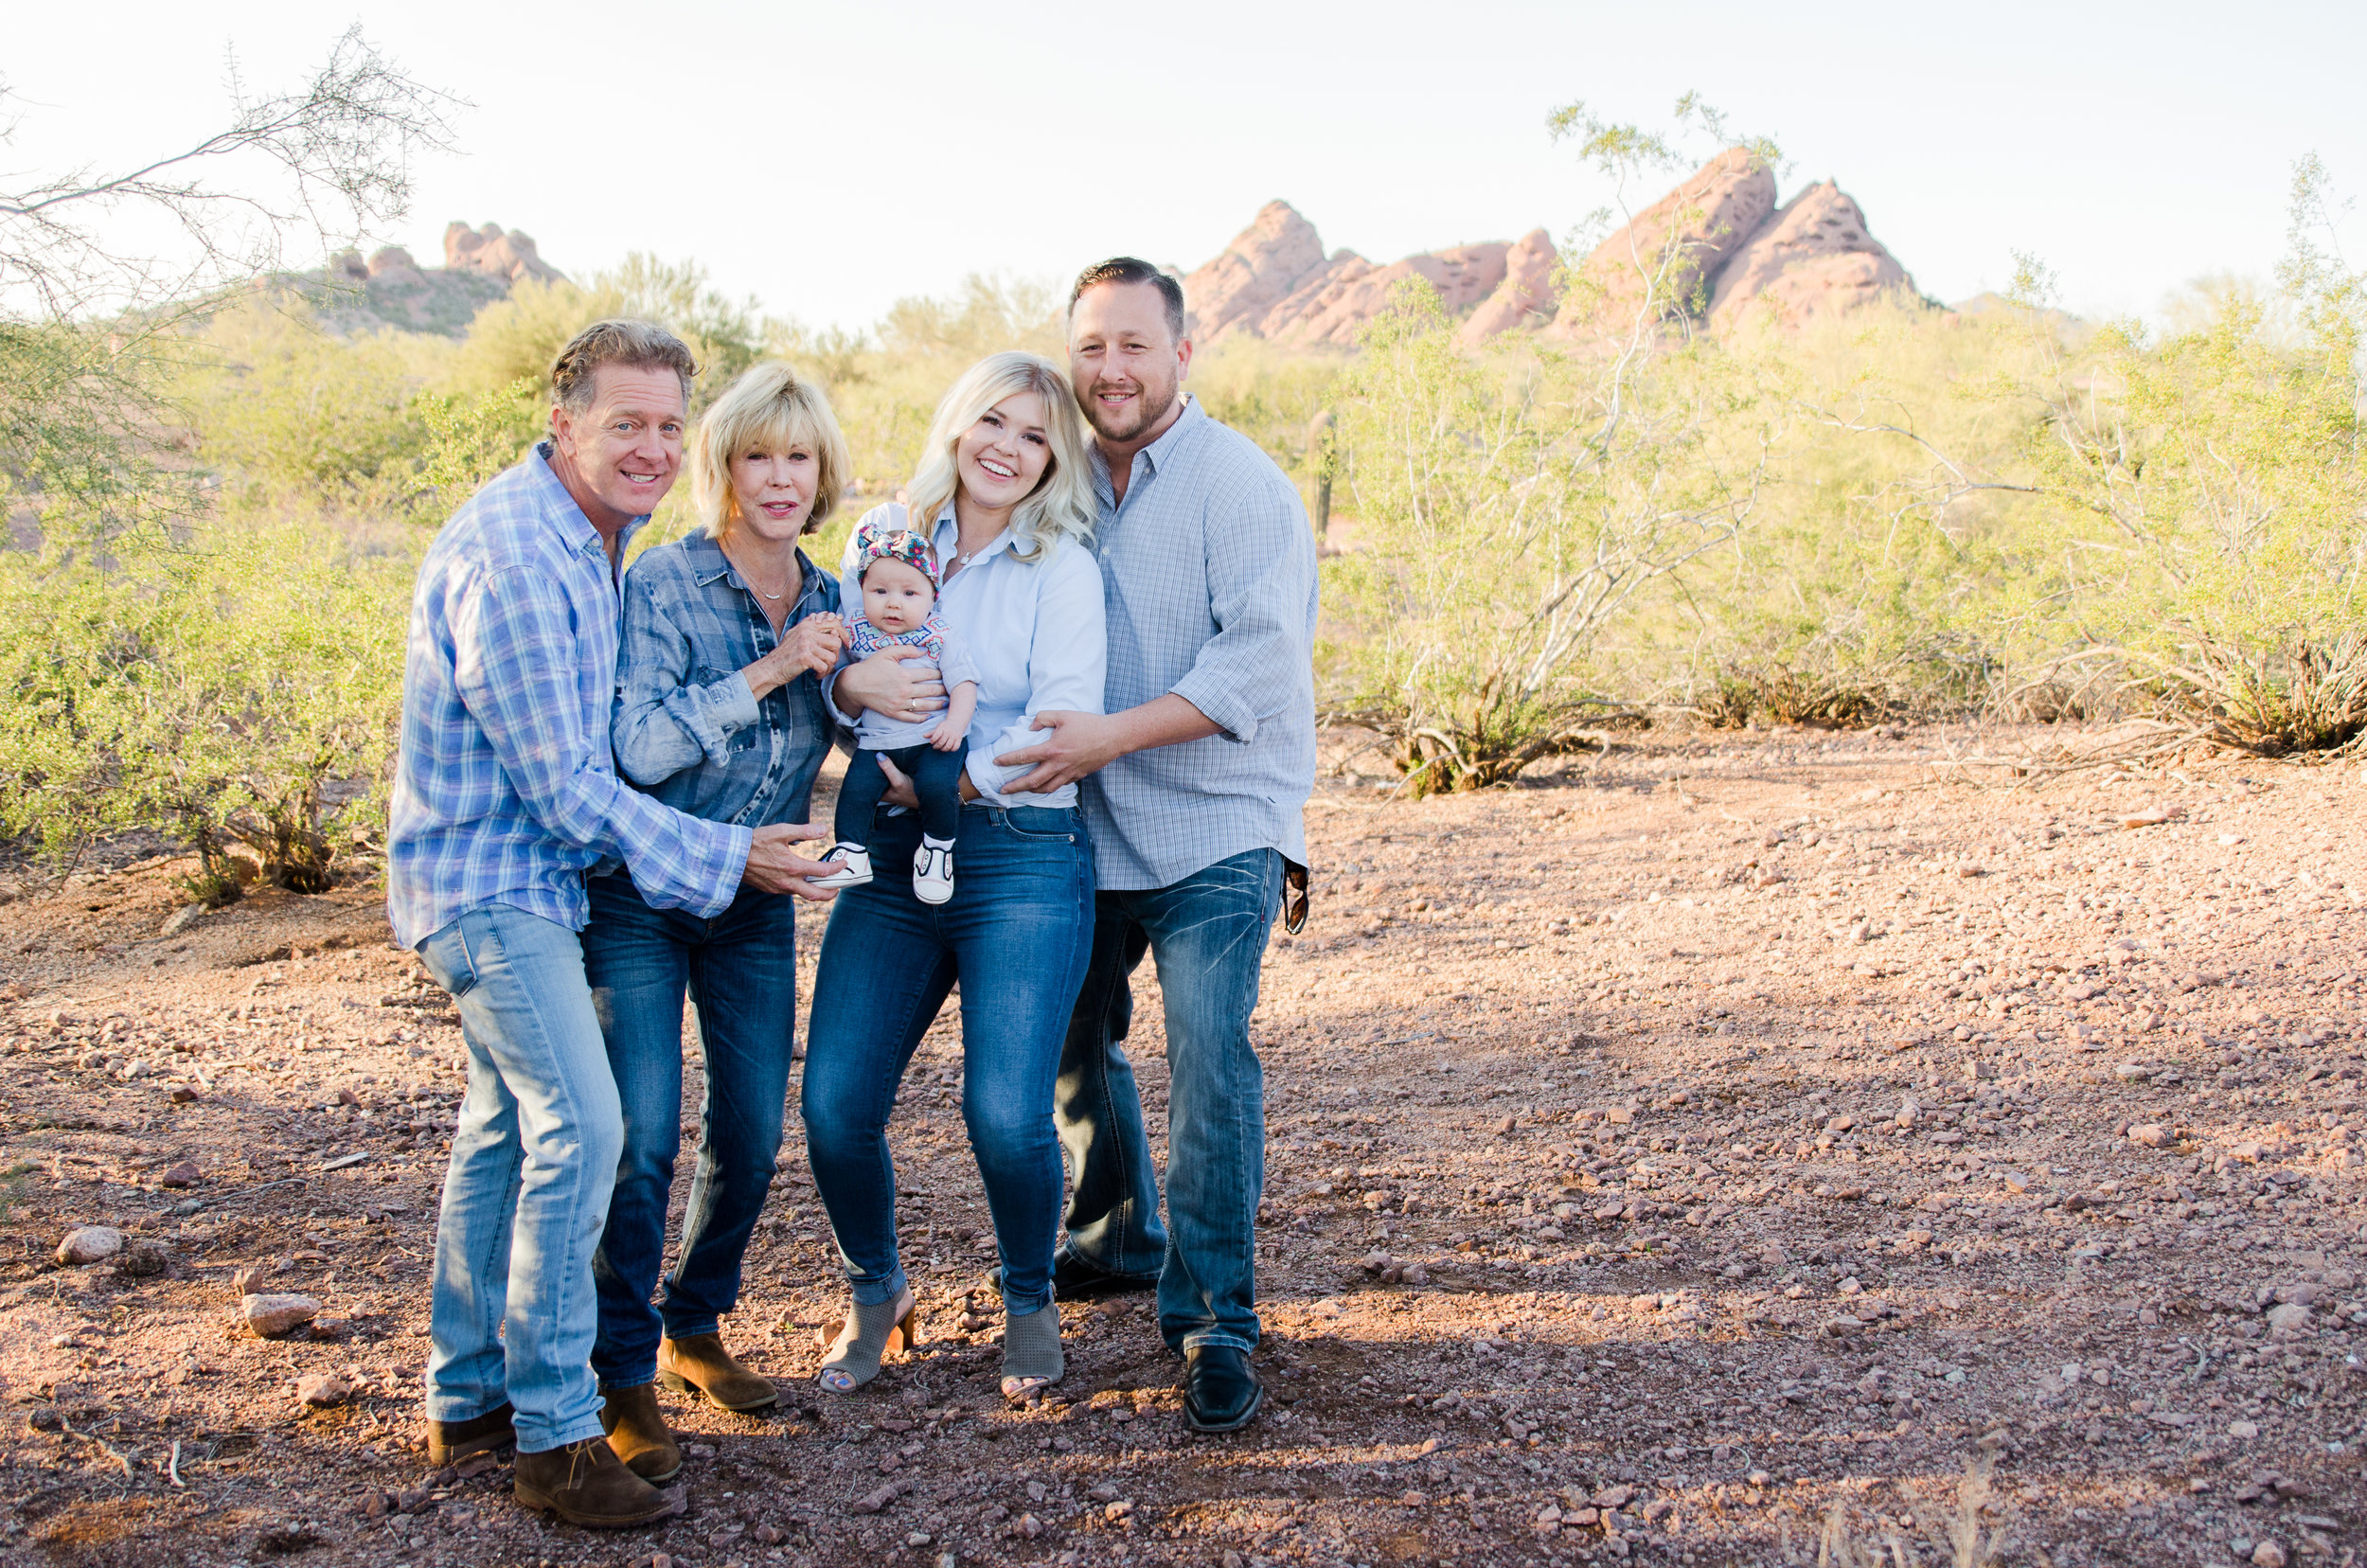 Scottsdale, AZ Family Session - Elegant Photographer